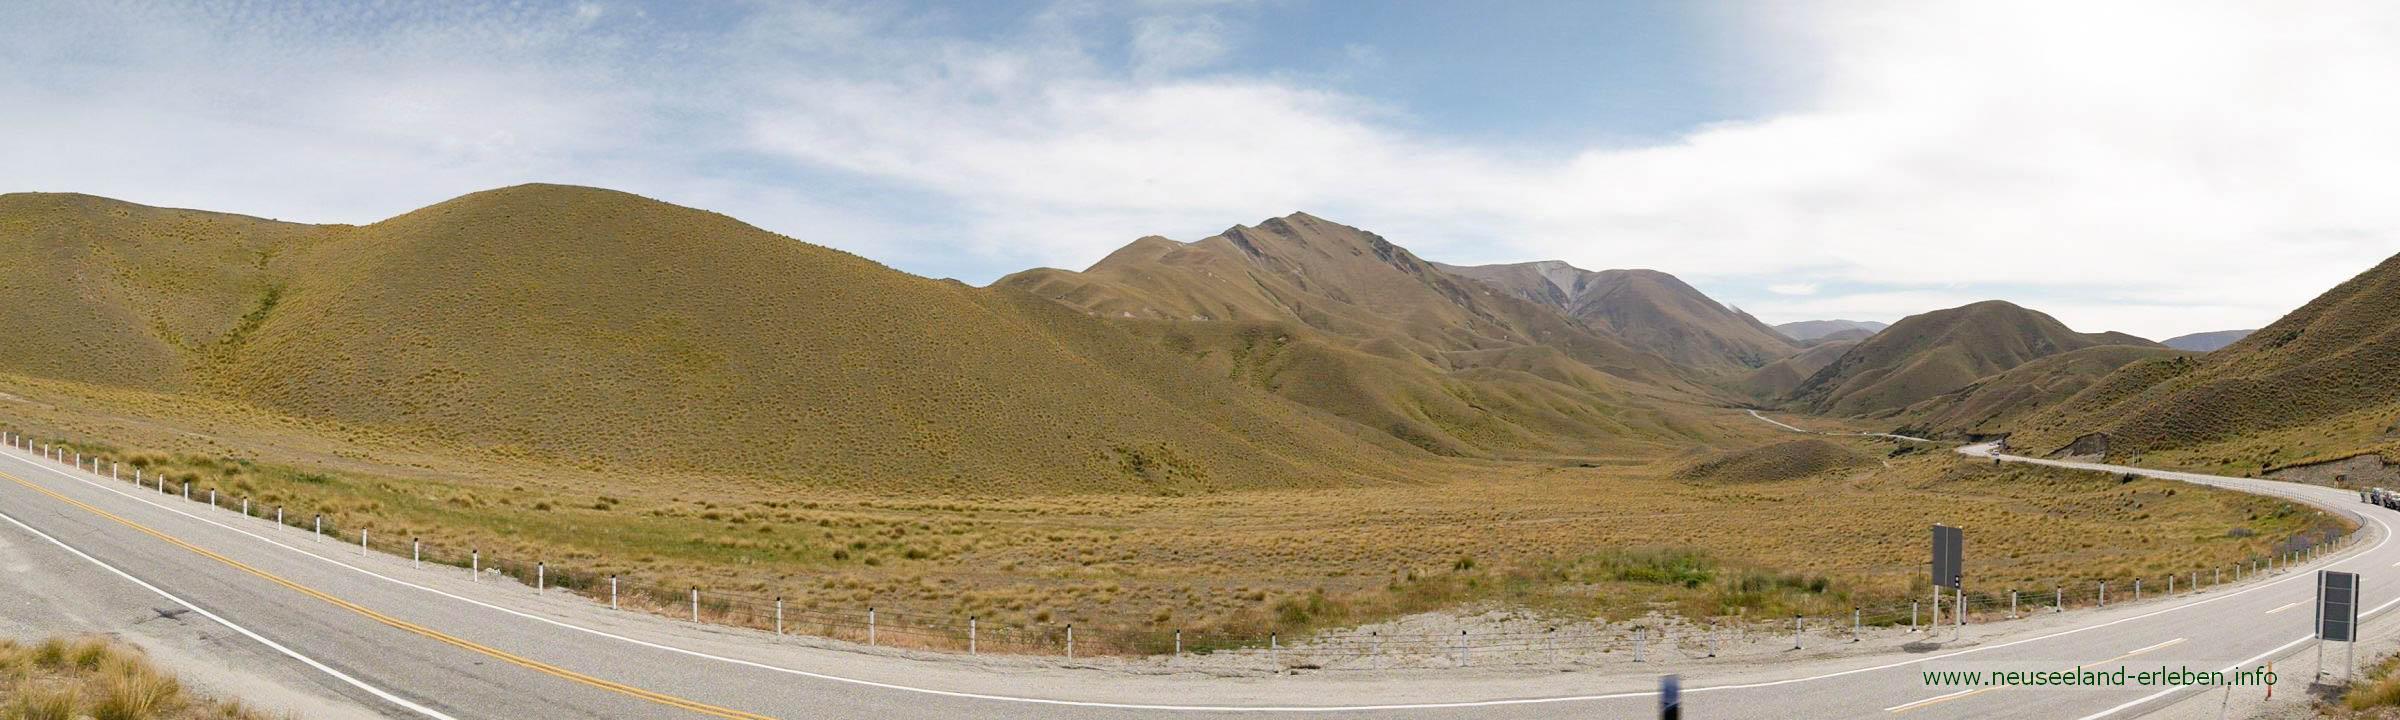 Lindis-Pass auf Neuseeland